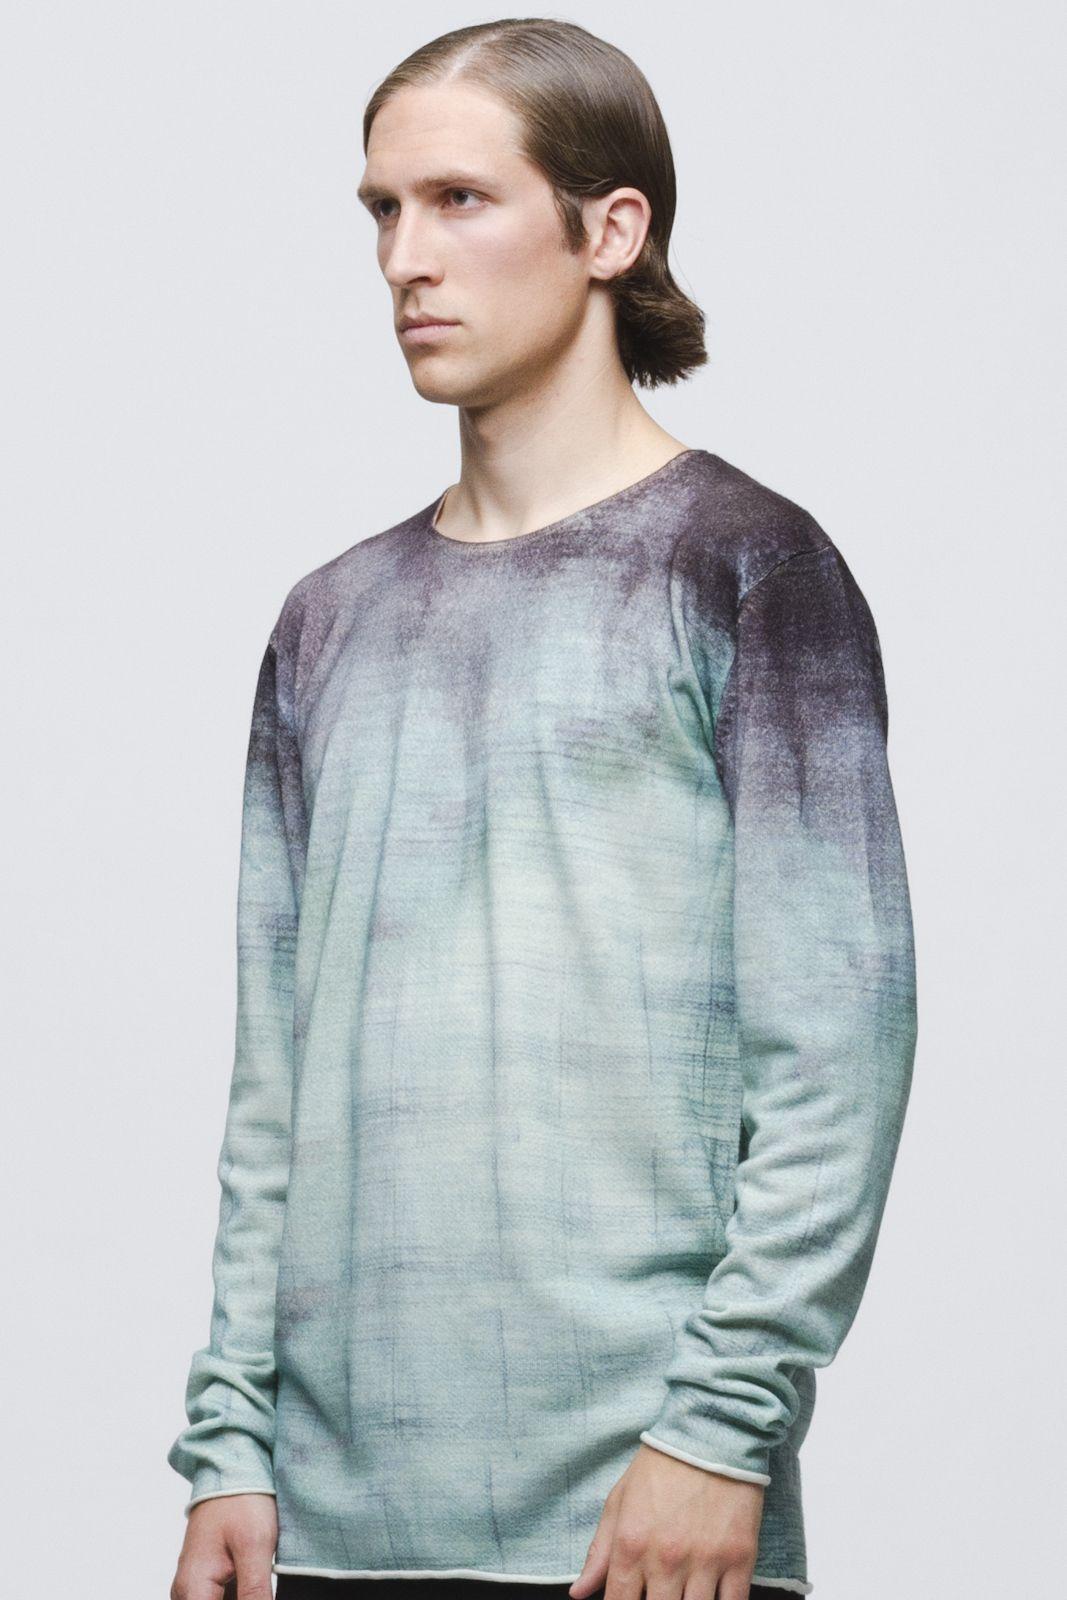 Viktor wool sweater from Norwegian brand LOPI STUDIO. www.lopi.no